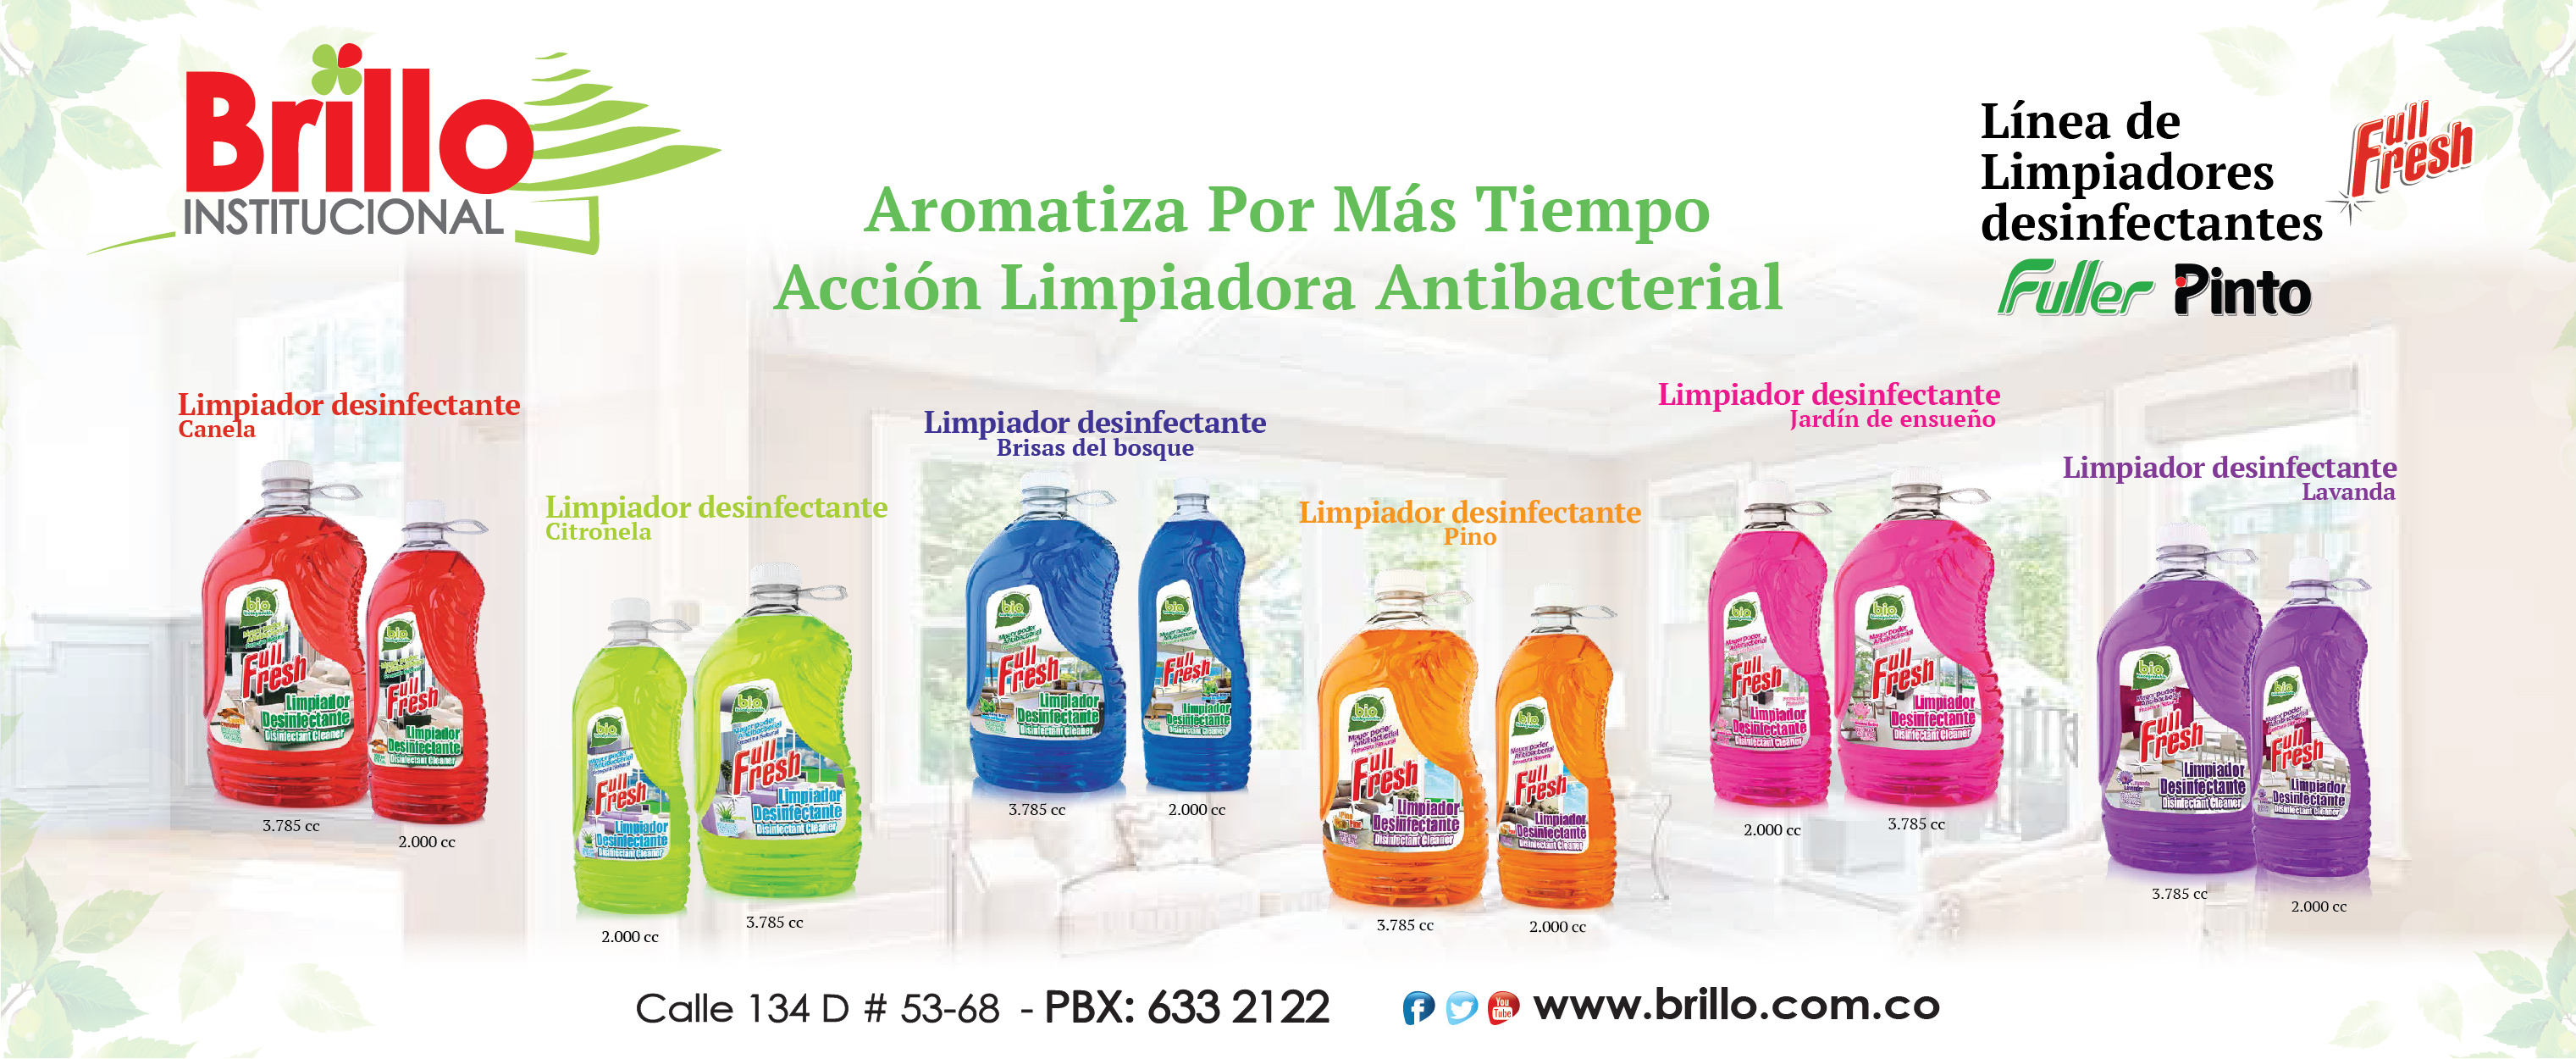 Limpiadores desinfectantes FULL FRESH